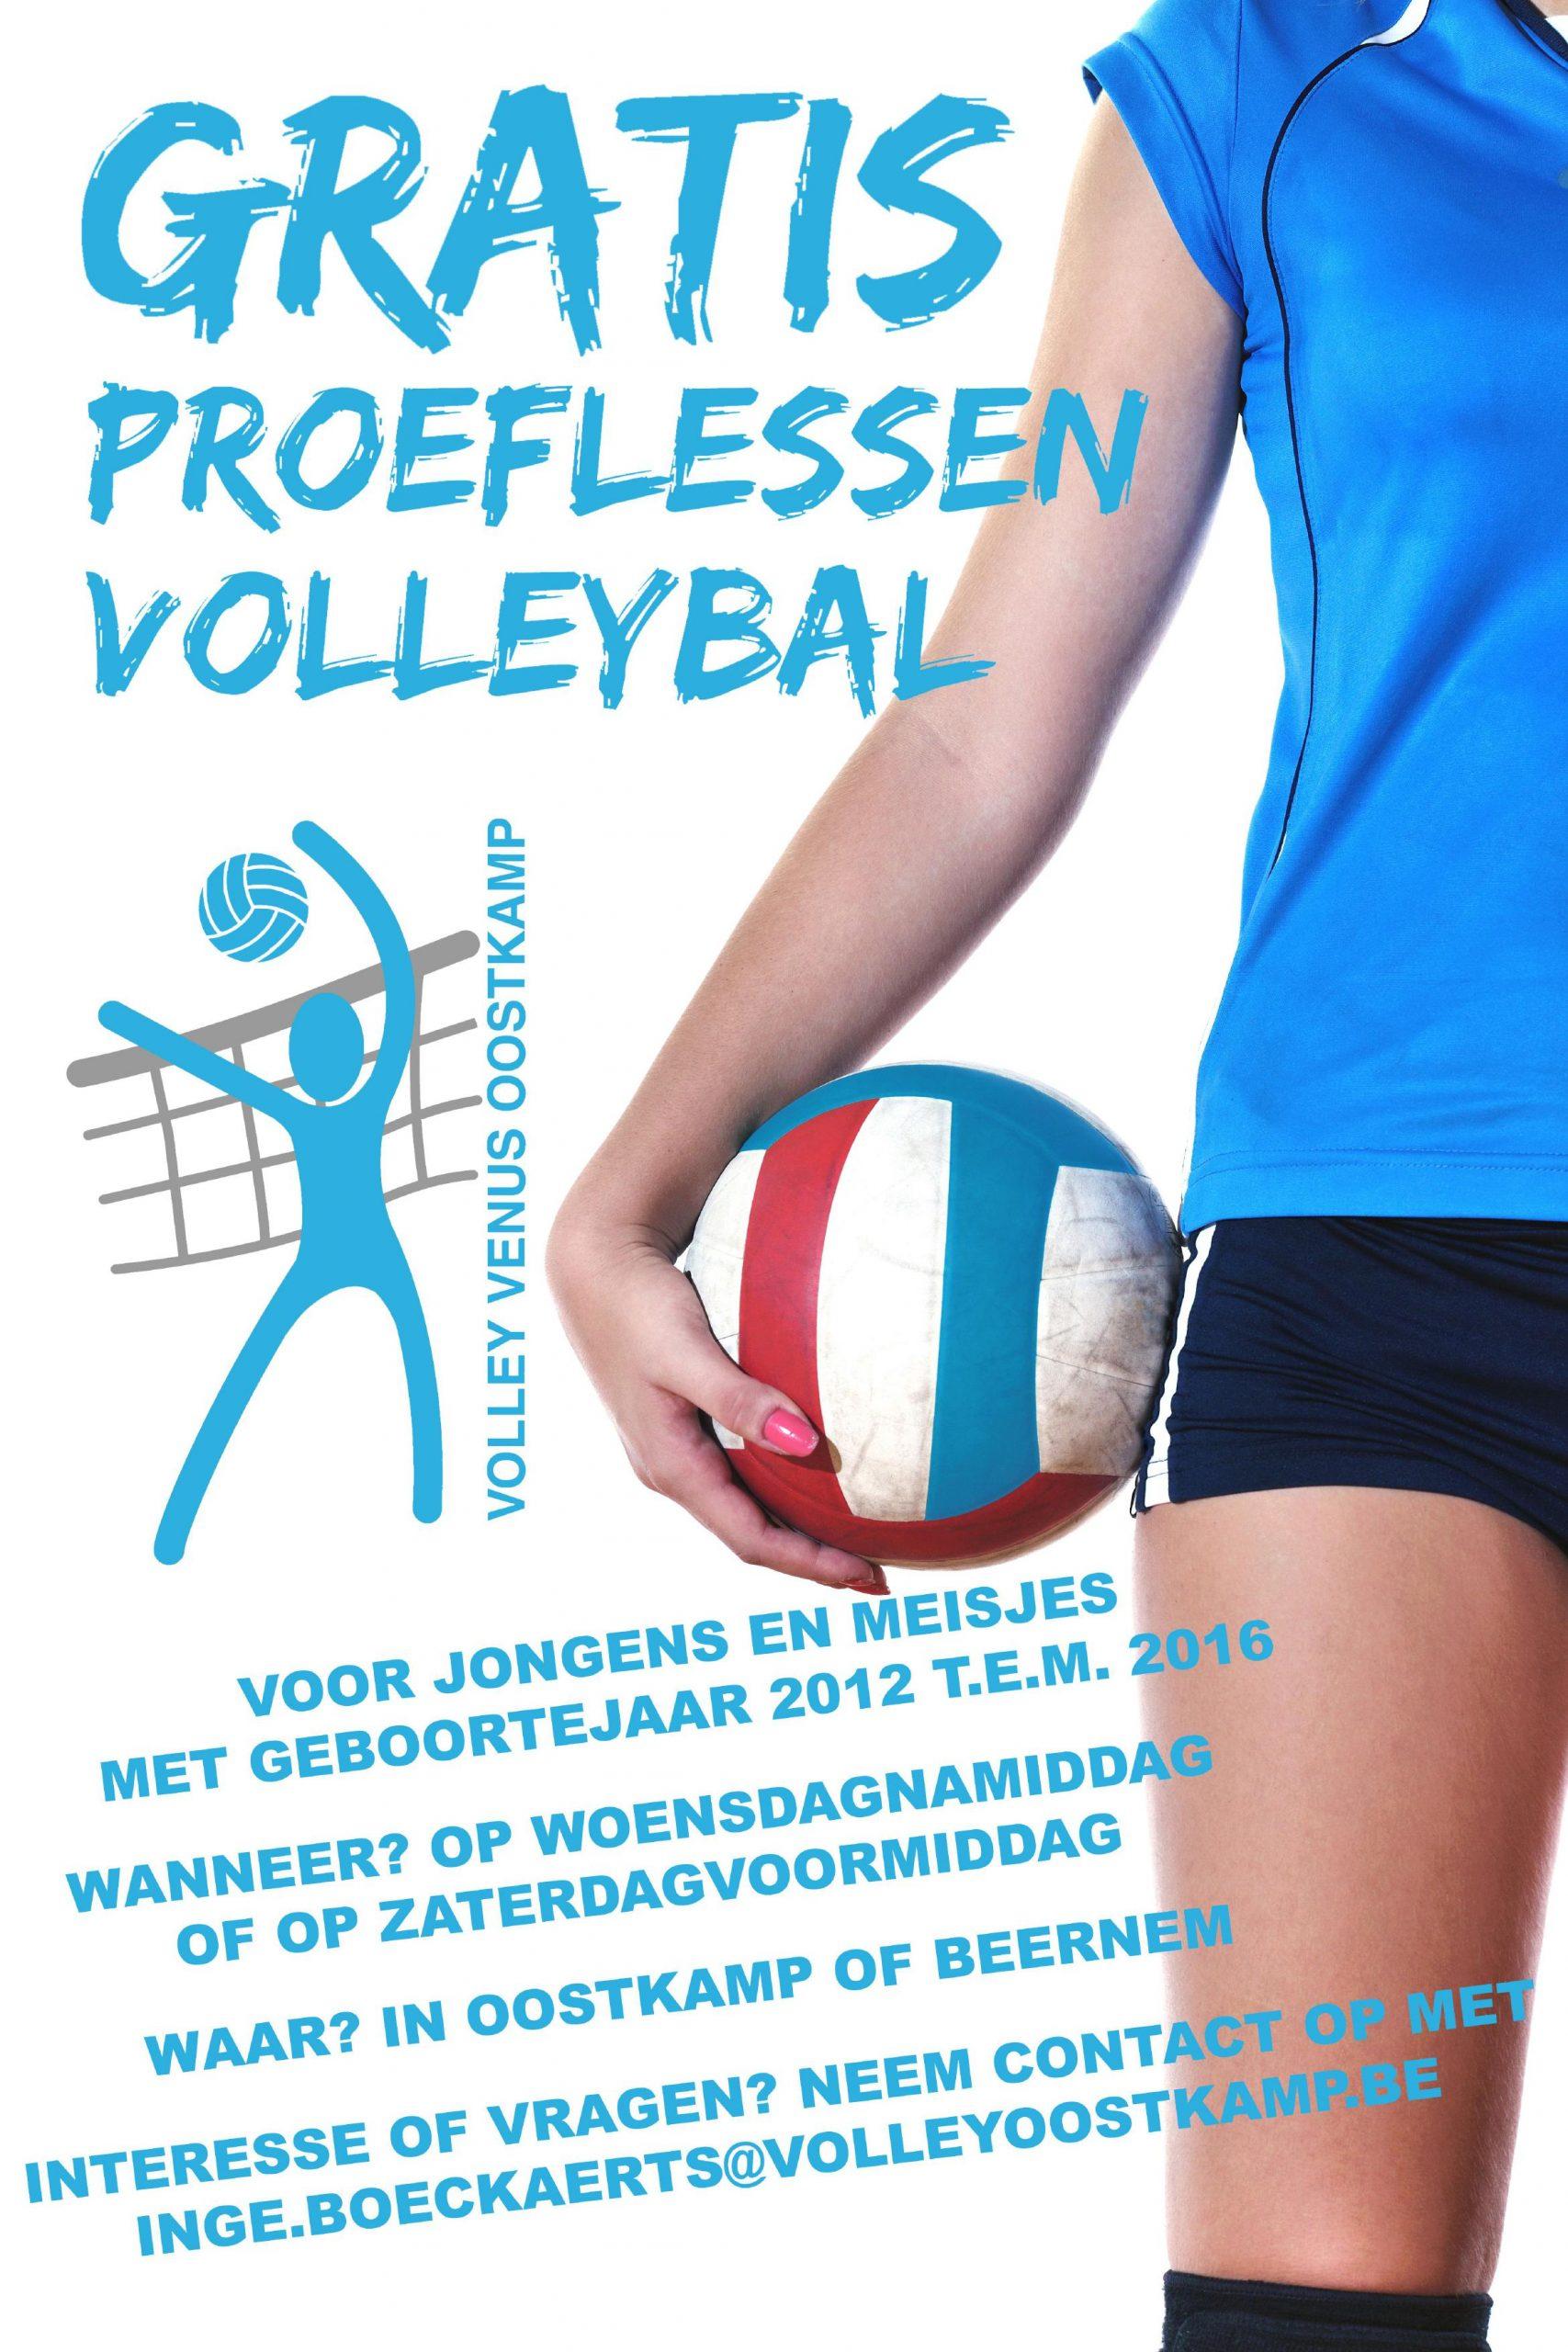 Gratis proeflessen volleybal!